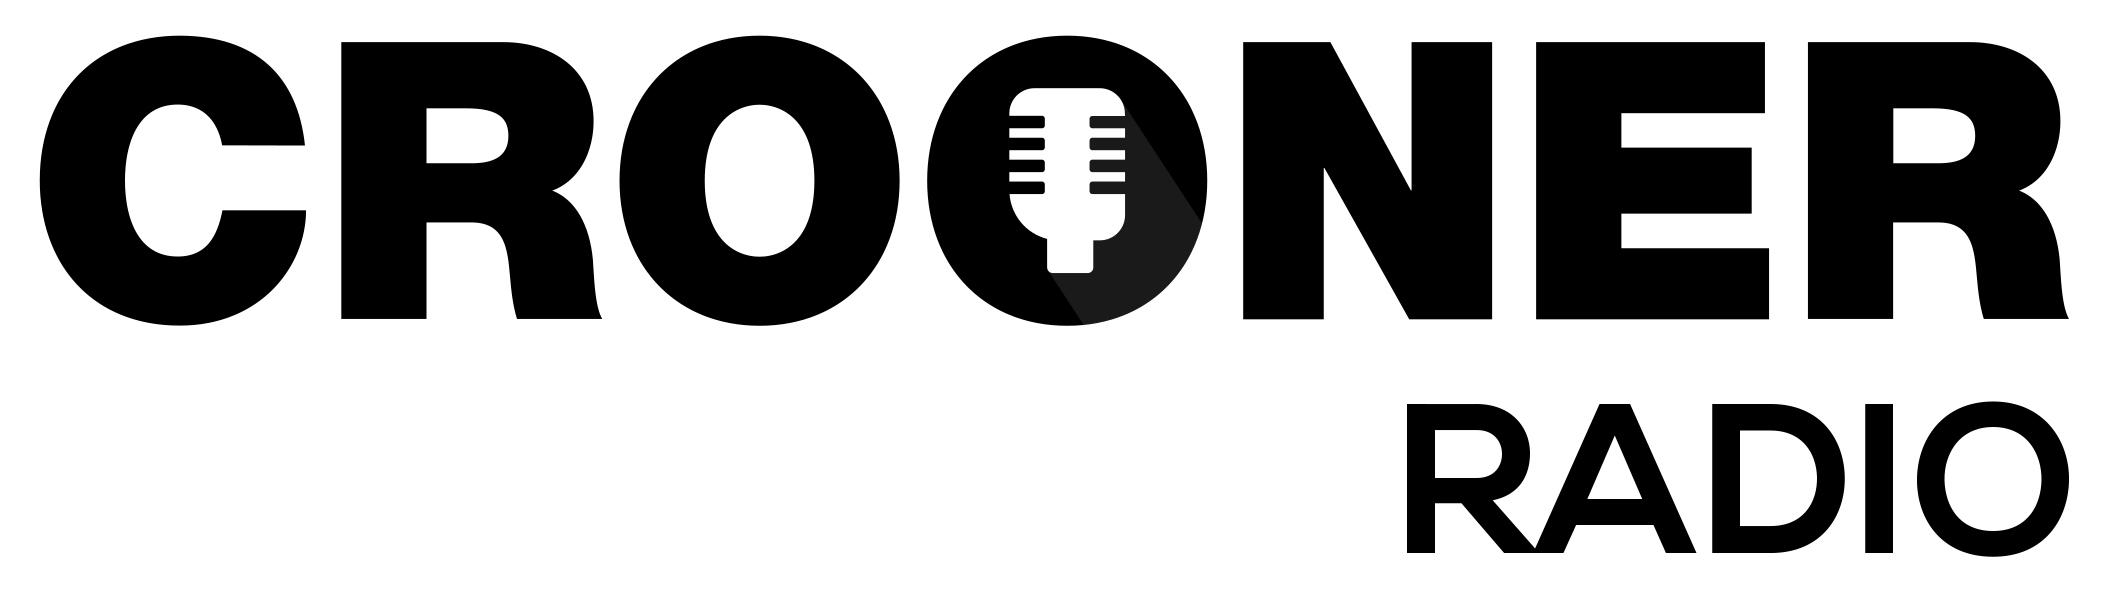 logo-dab+-rnt-crooner-radio-france